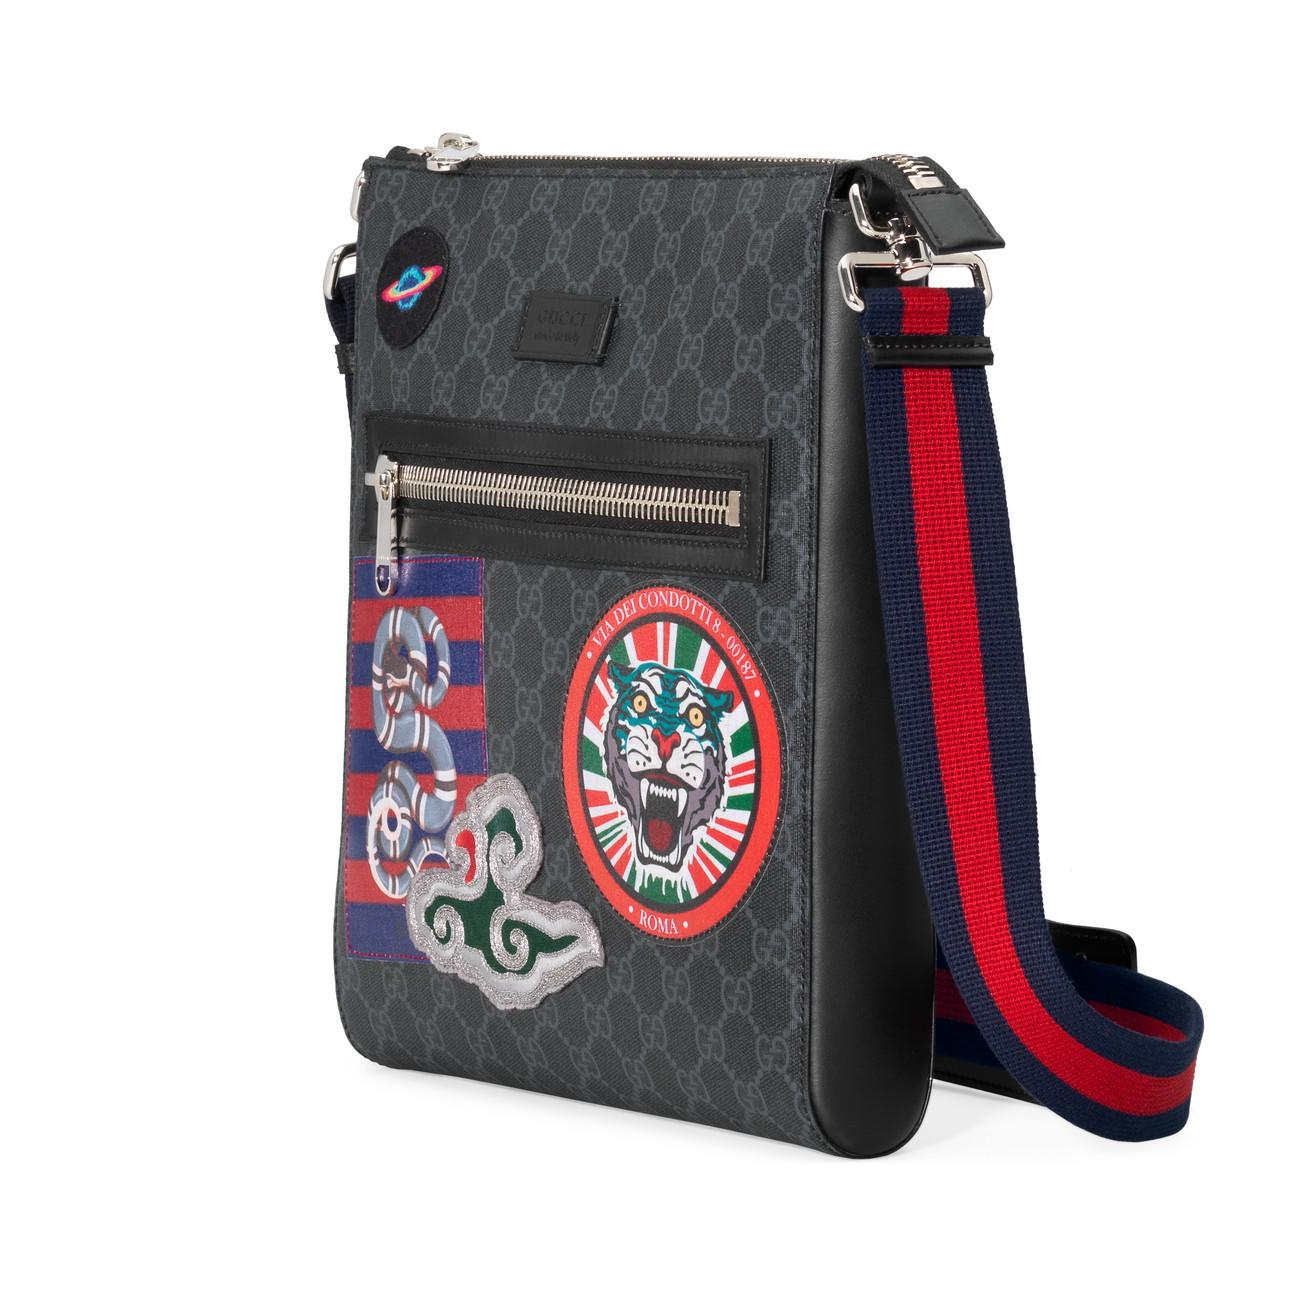 9bf05ff8b75c Gucci - Multicolor Night Courrier GG Supreme Messenger for Men - Lyst. View  fullscreen